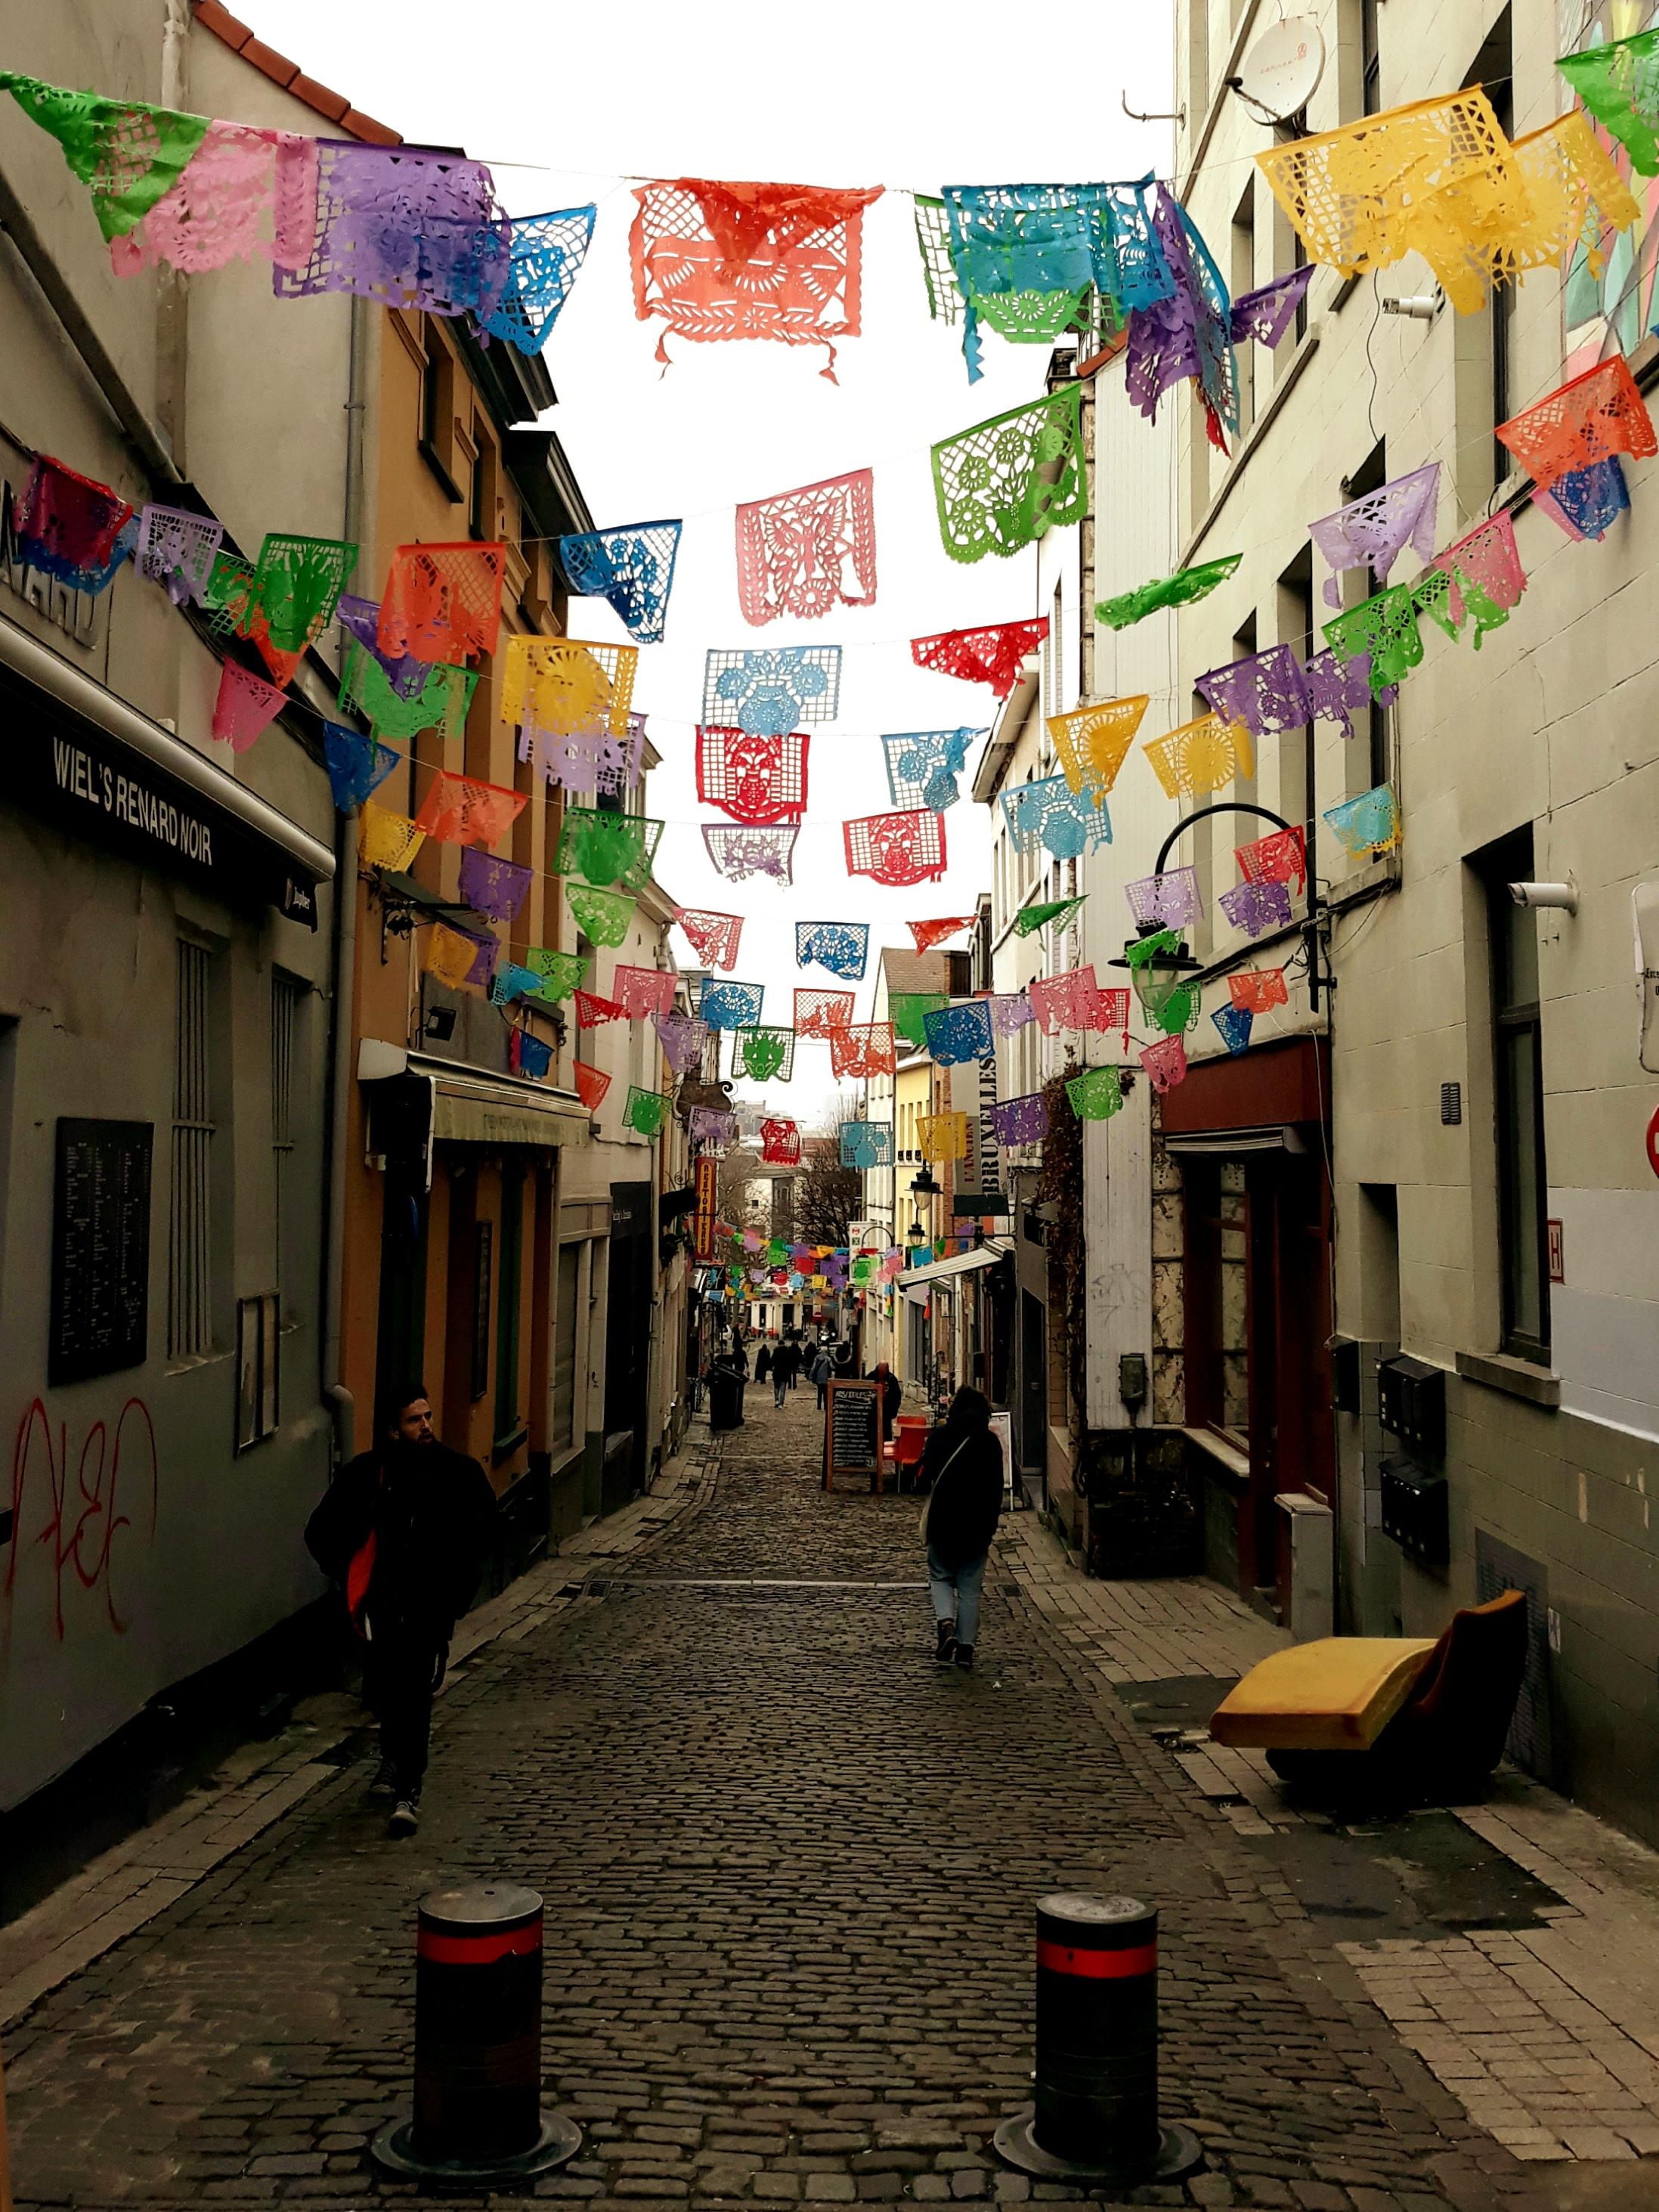 Narrow Lanes of Brussels